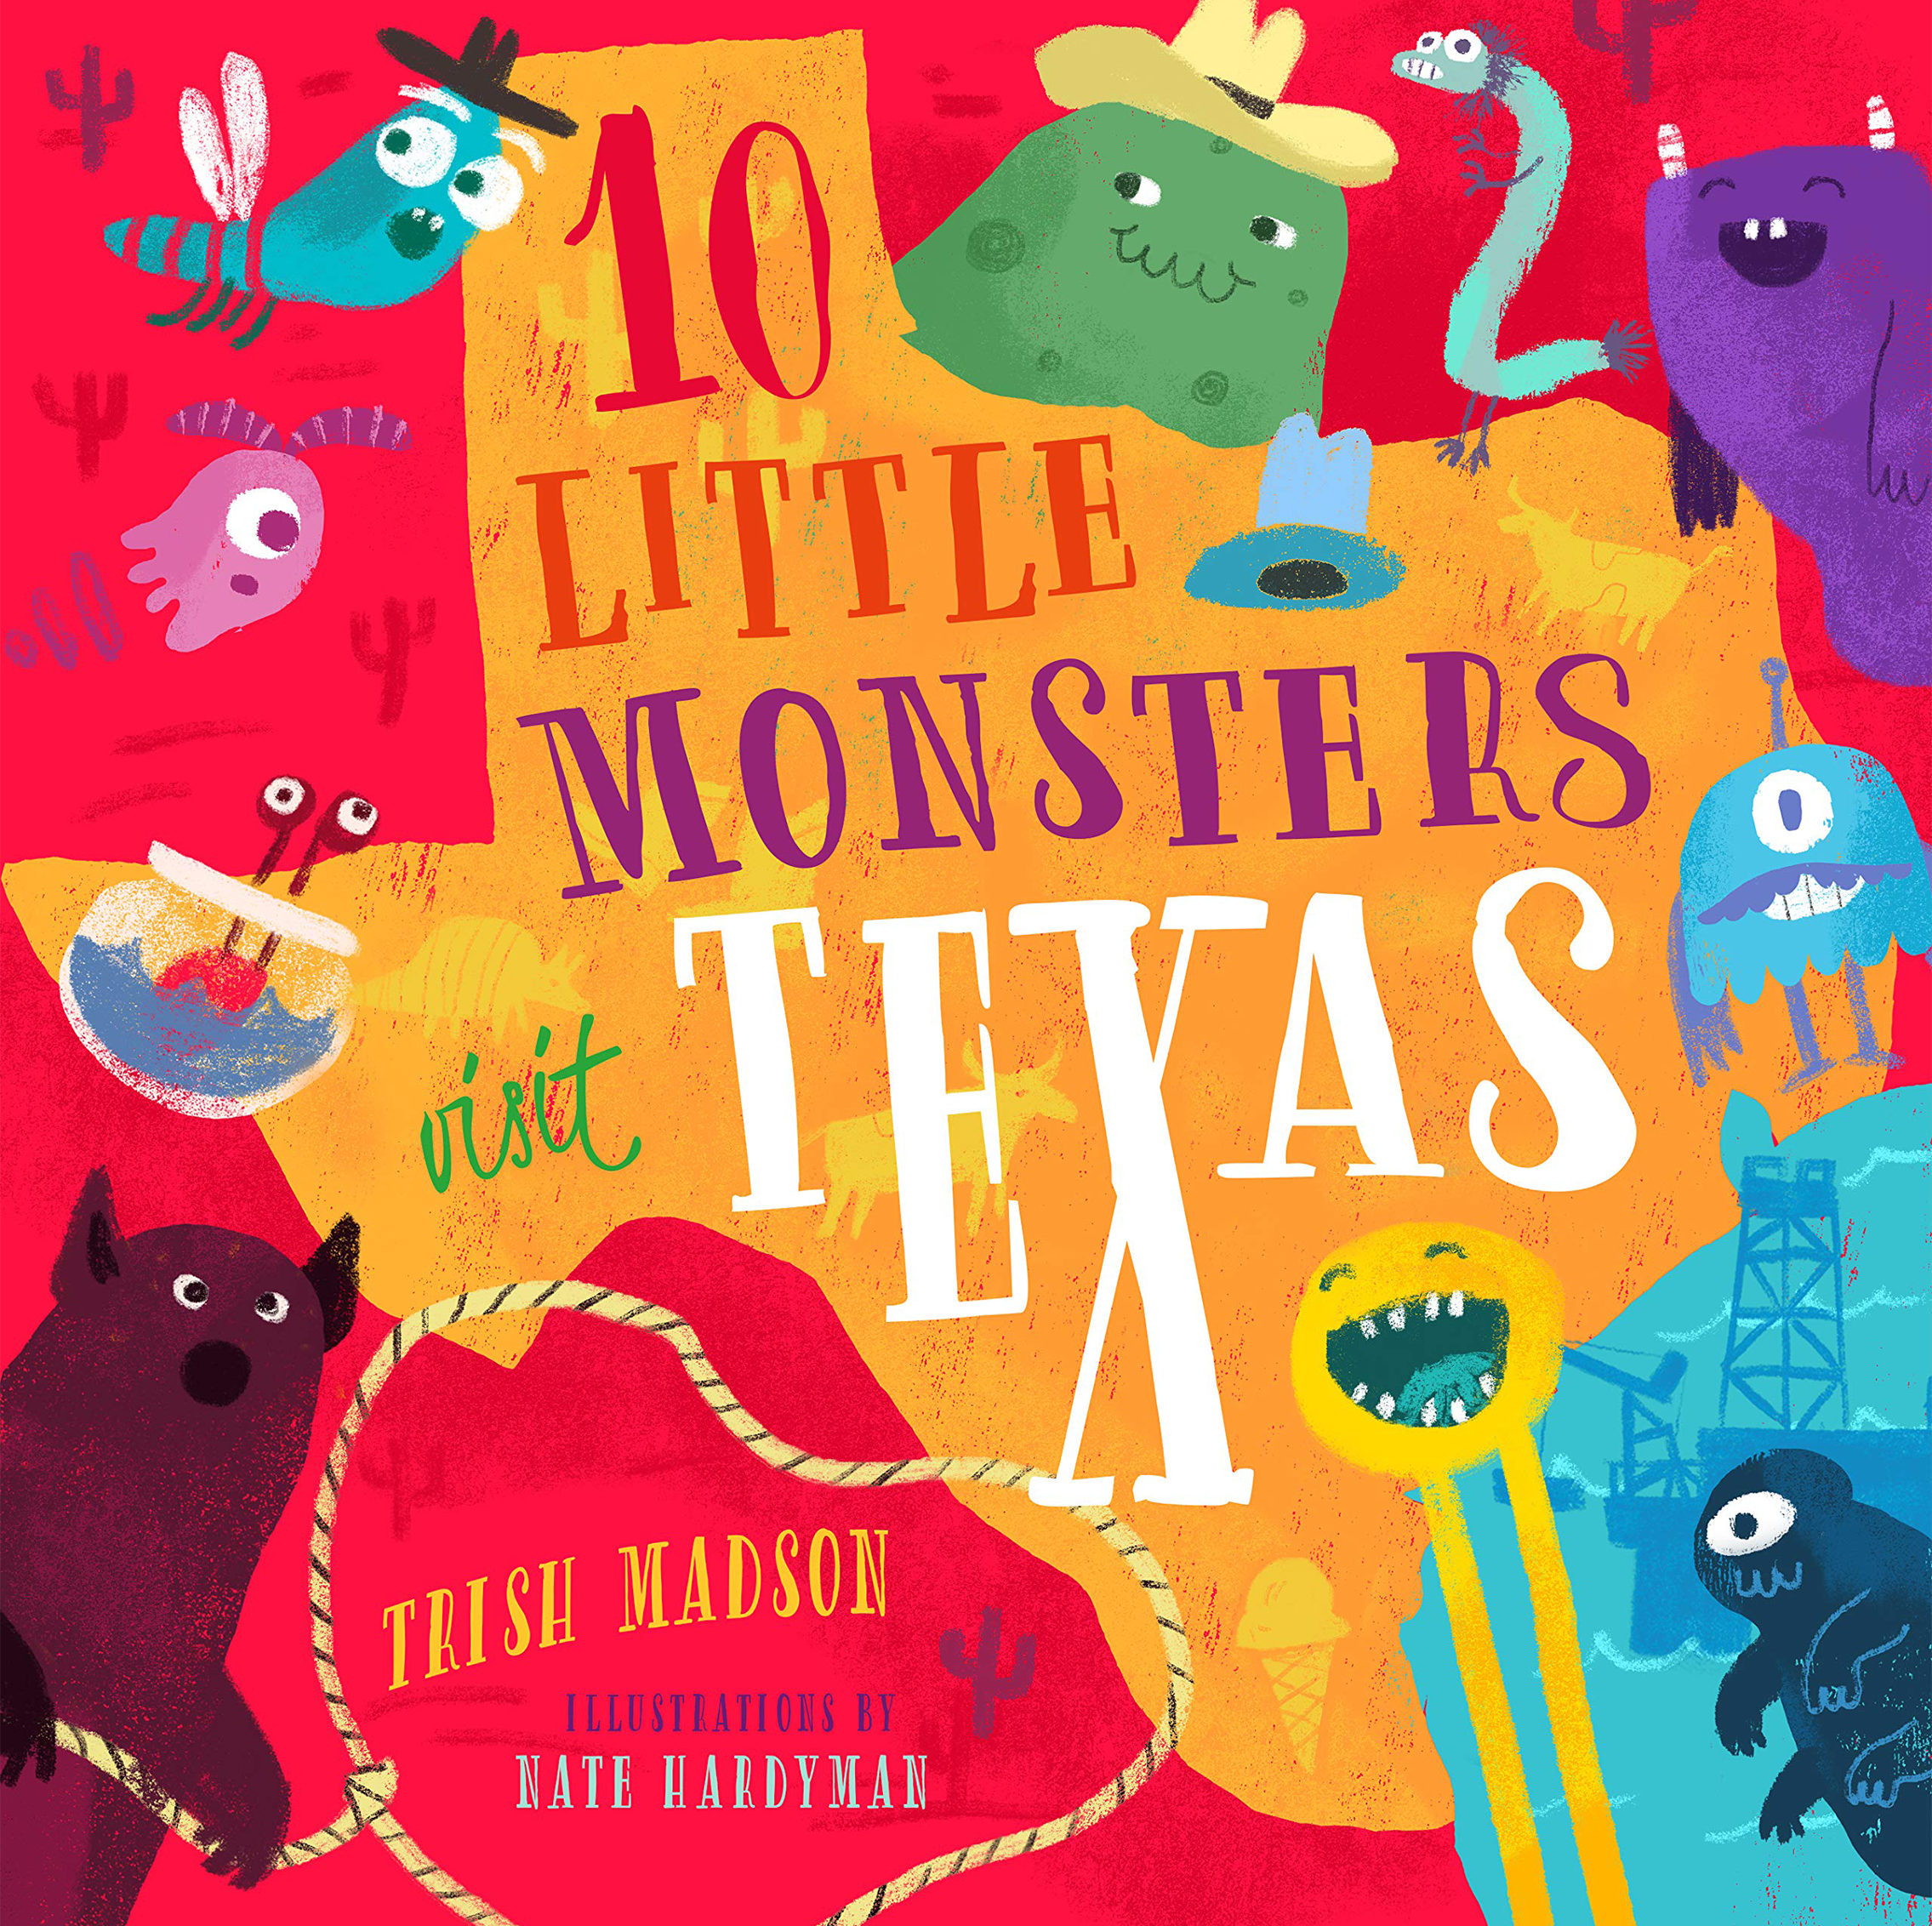 Ten Little Monsters Visit Texas